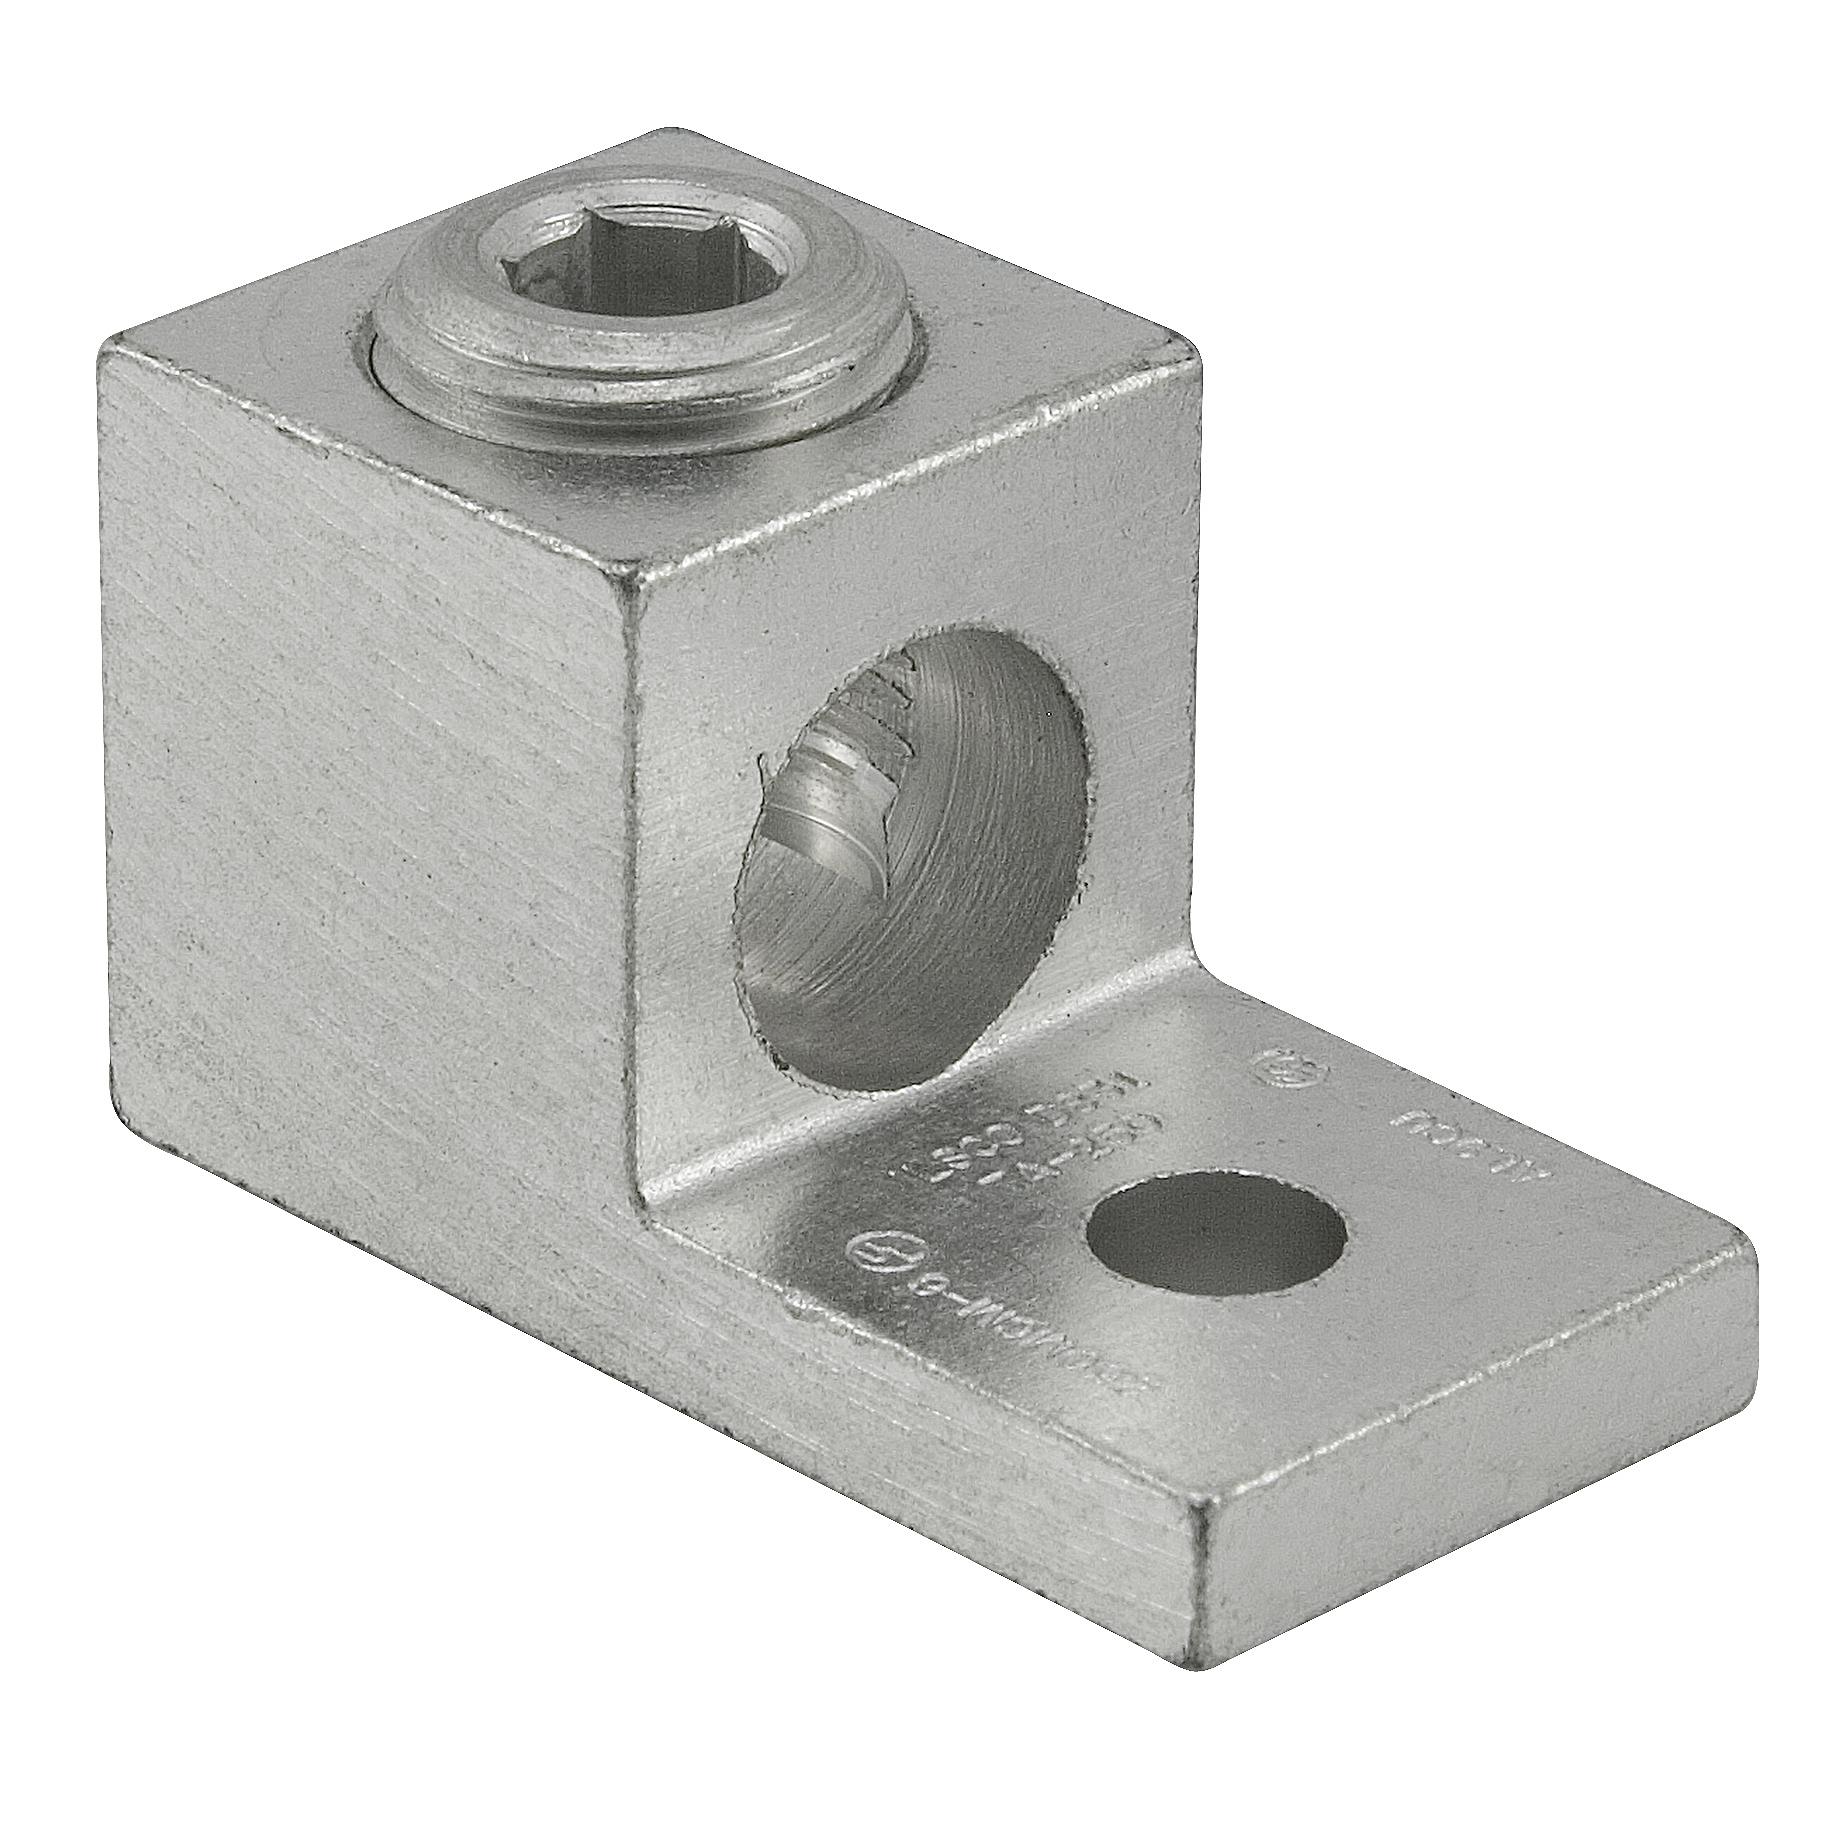 ILS TA-250 6-250 ALCU LUG cs=25